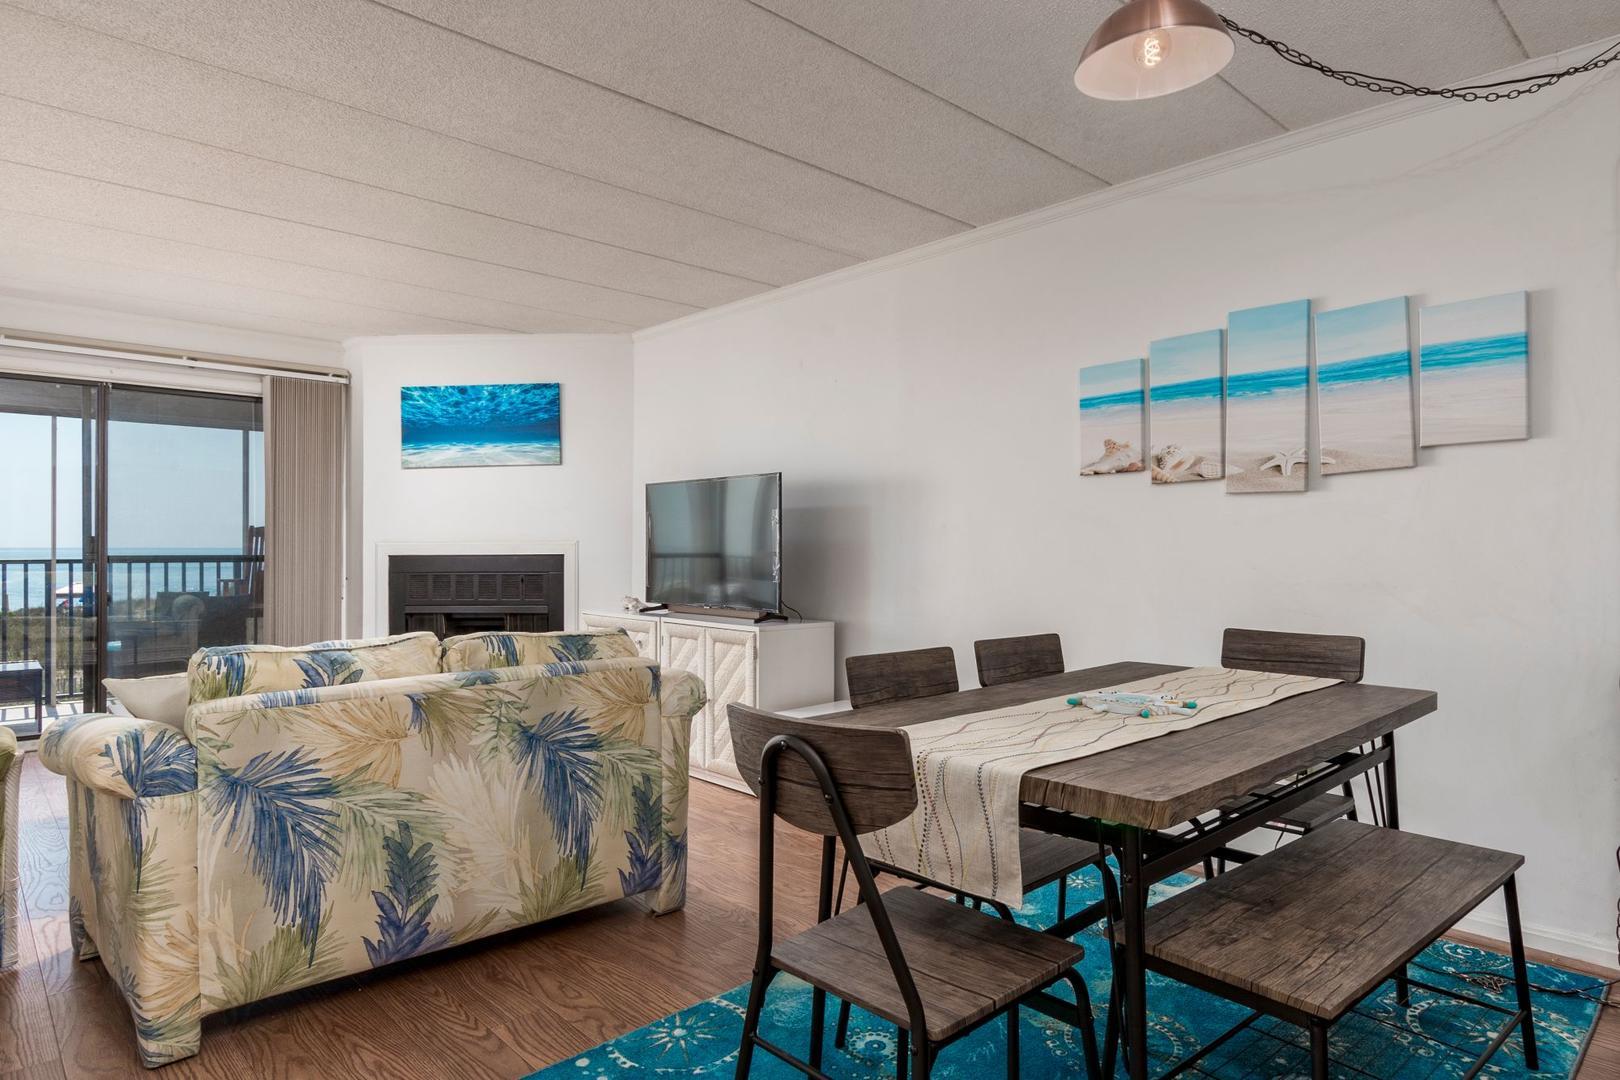 Amber Waves 101 - Living Room with Ocean Views